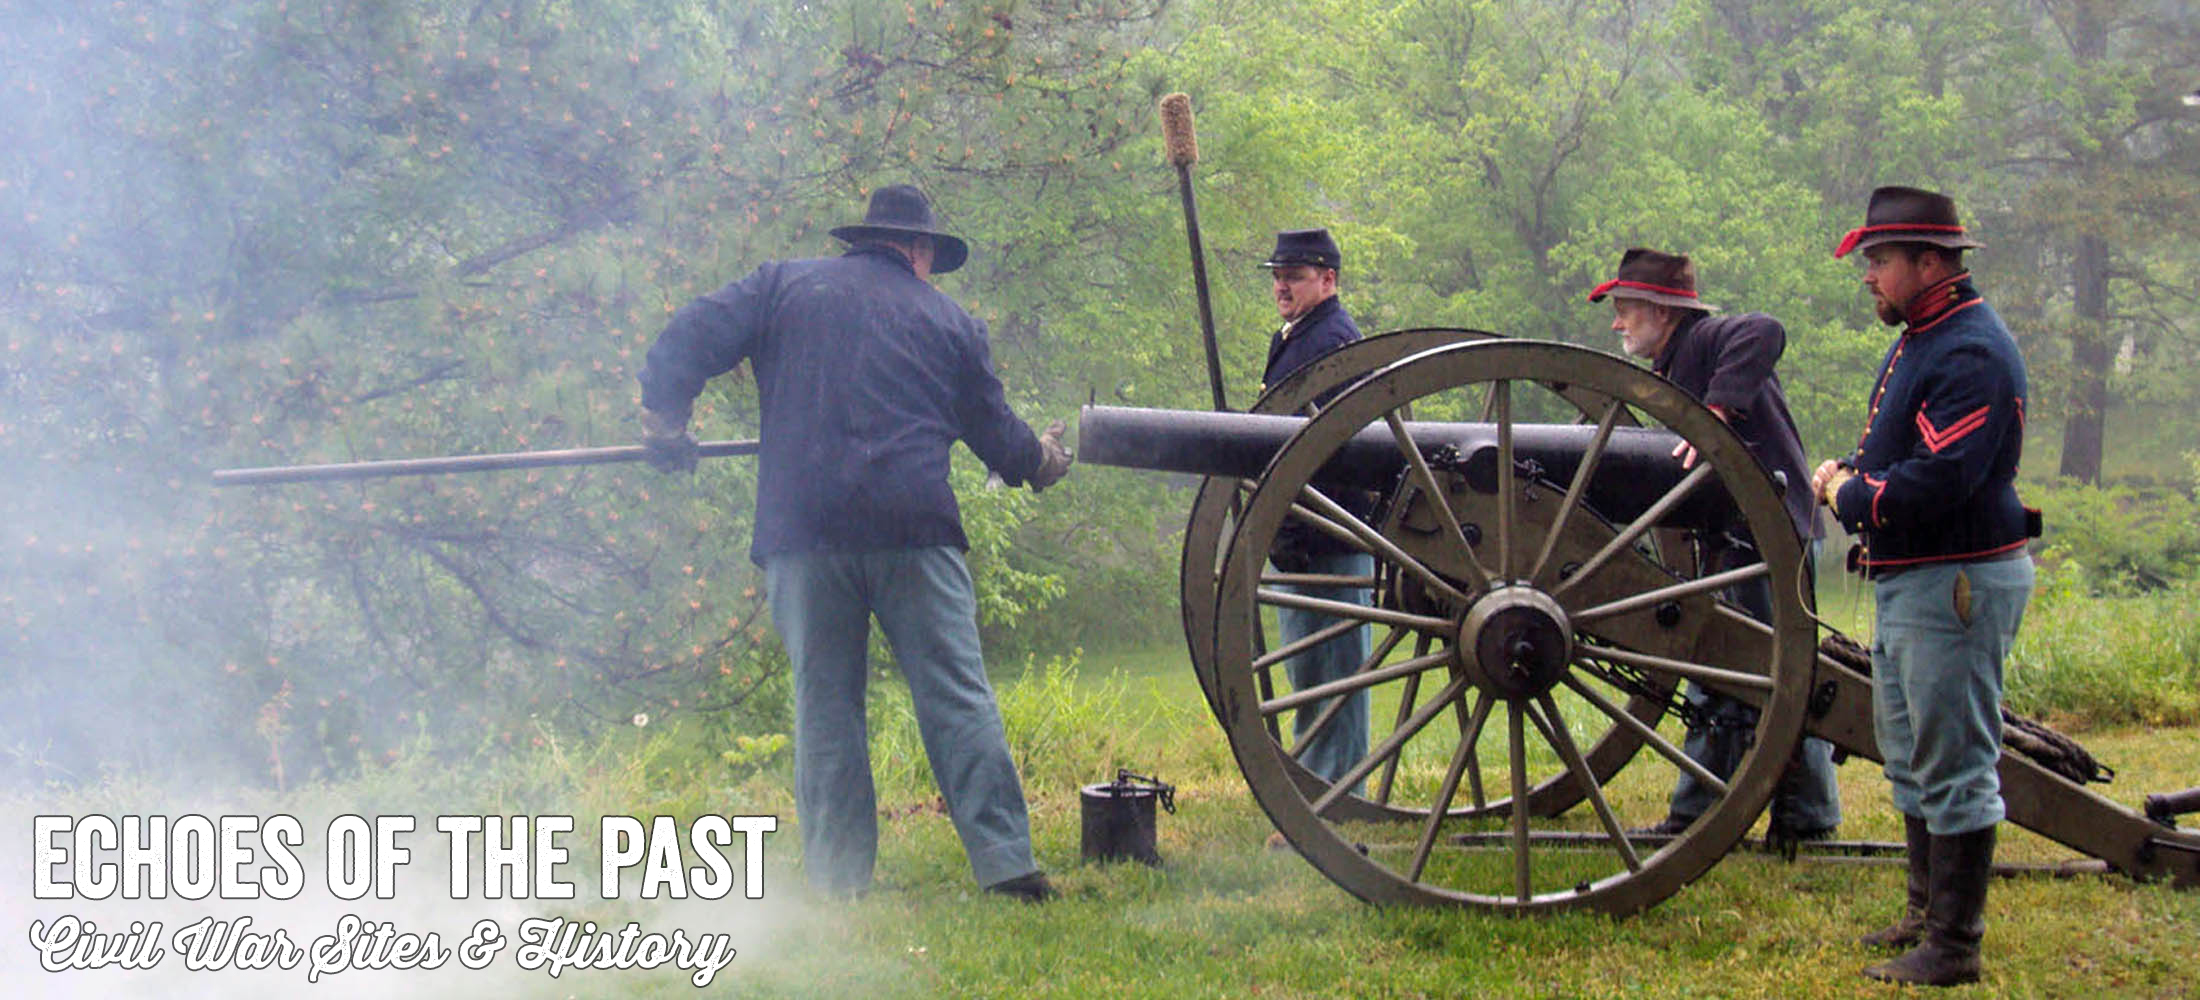 Civil War - Visit Cleveland TN